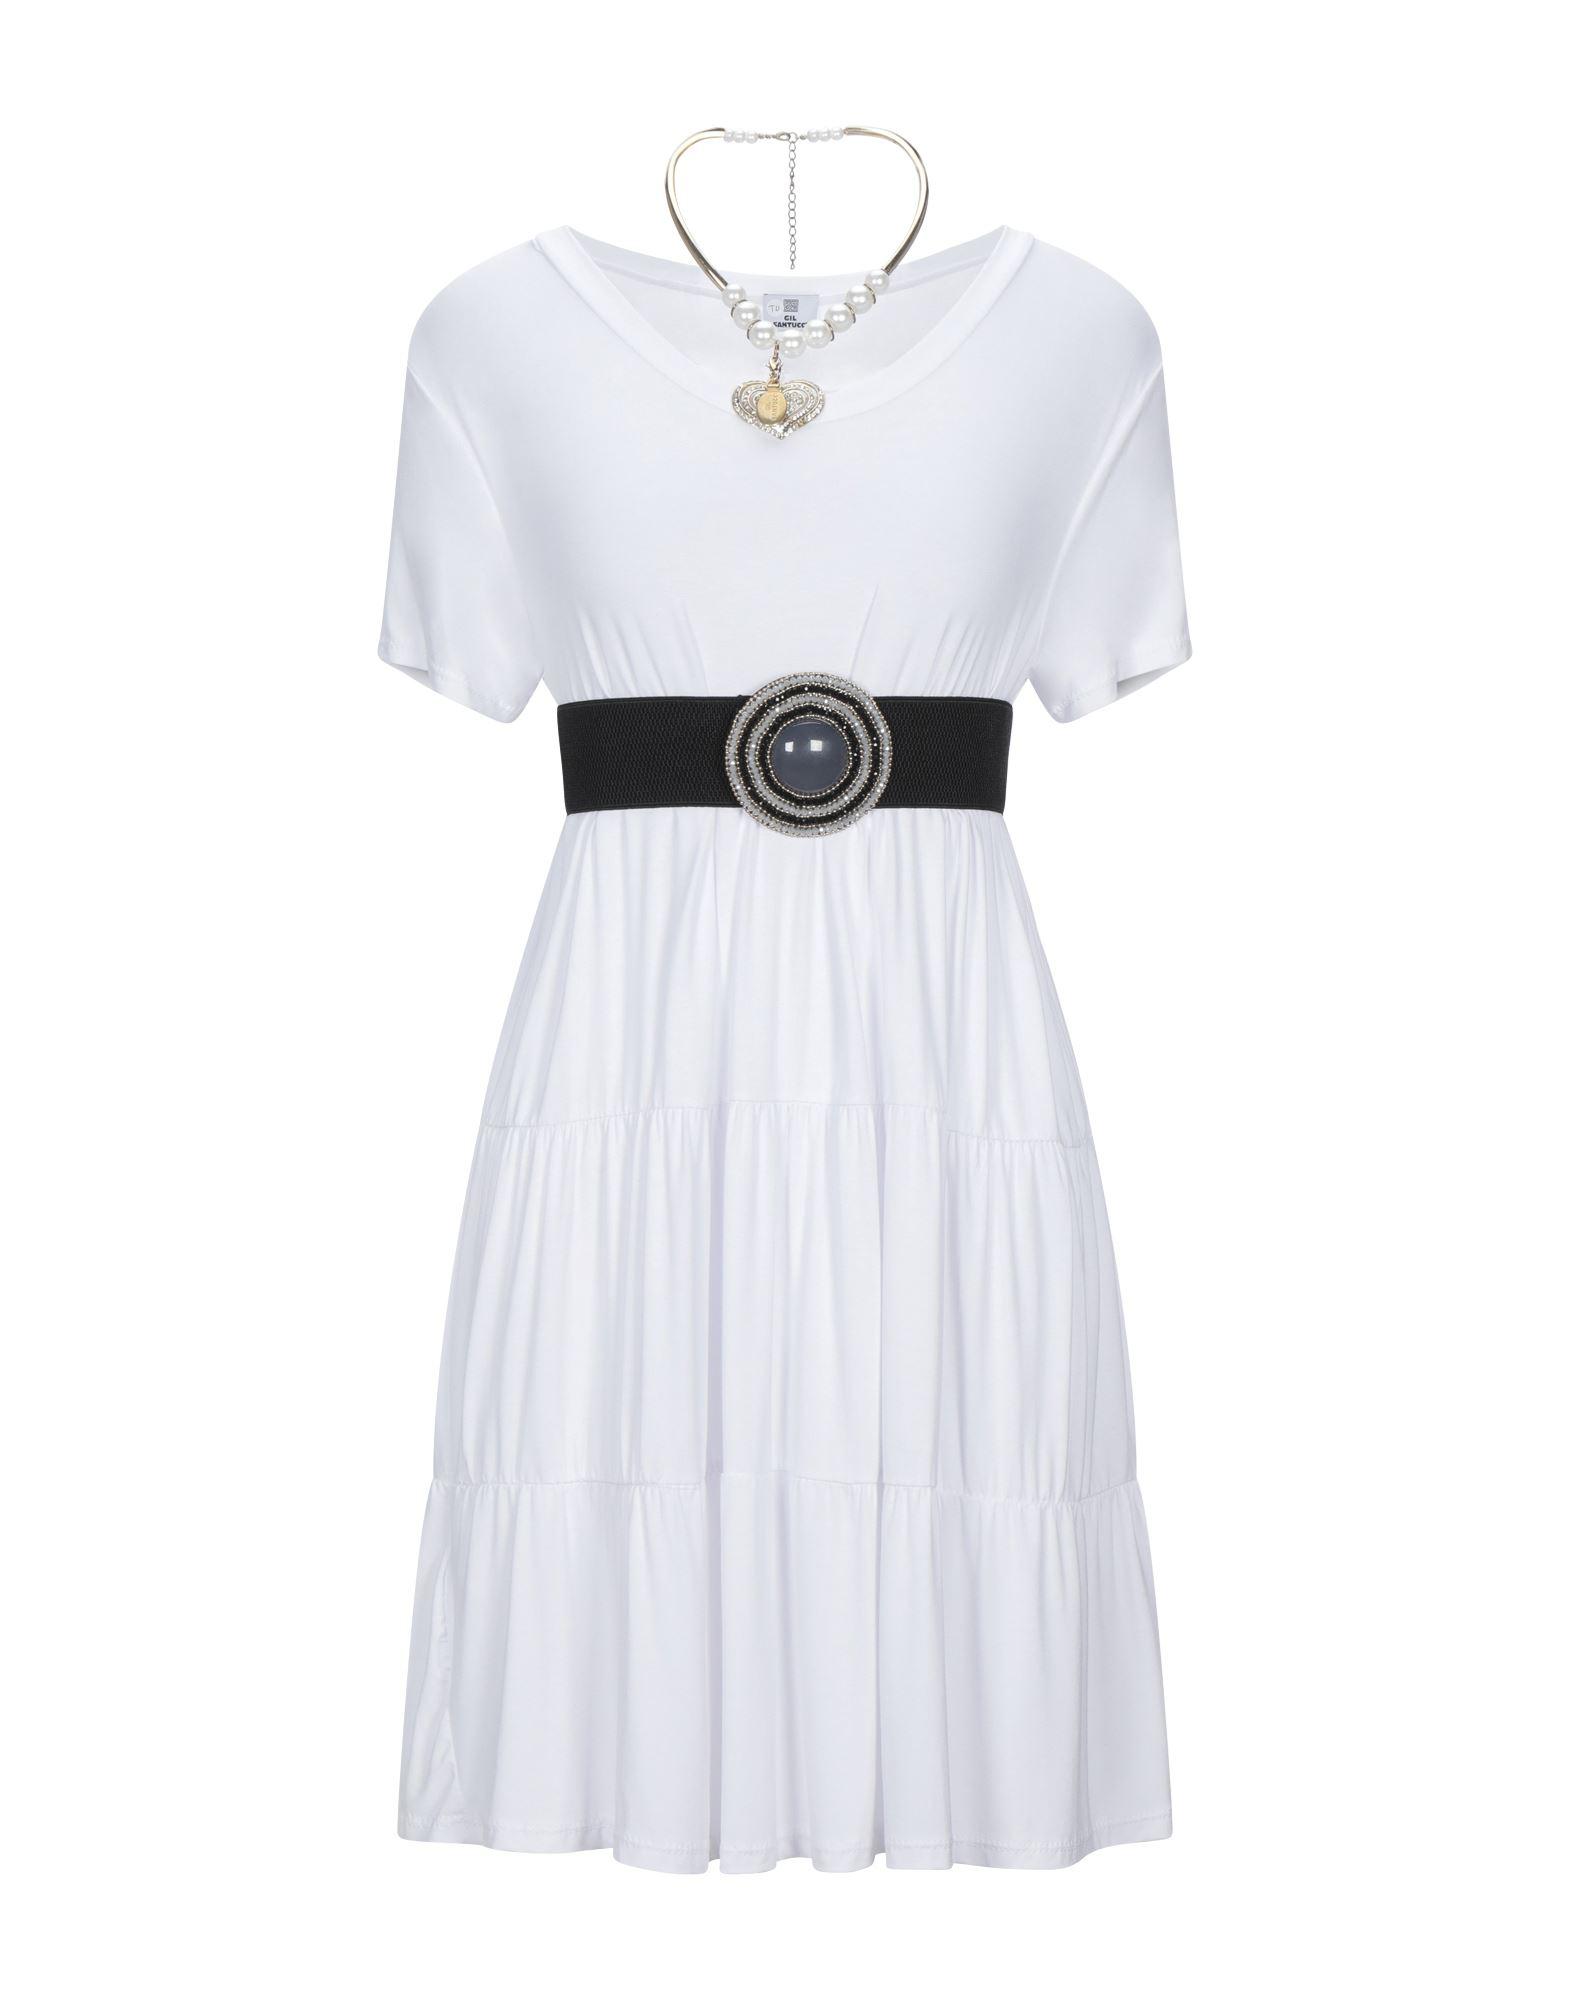 Фото - GIL SANTUCCI Короткое платье gil santucci длинное платье